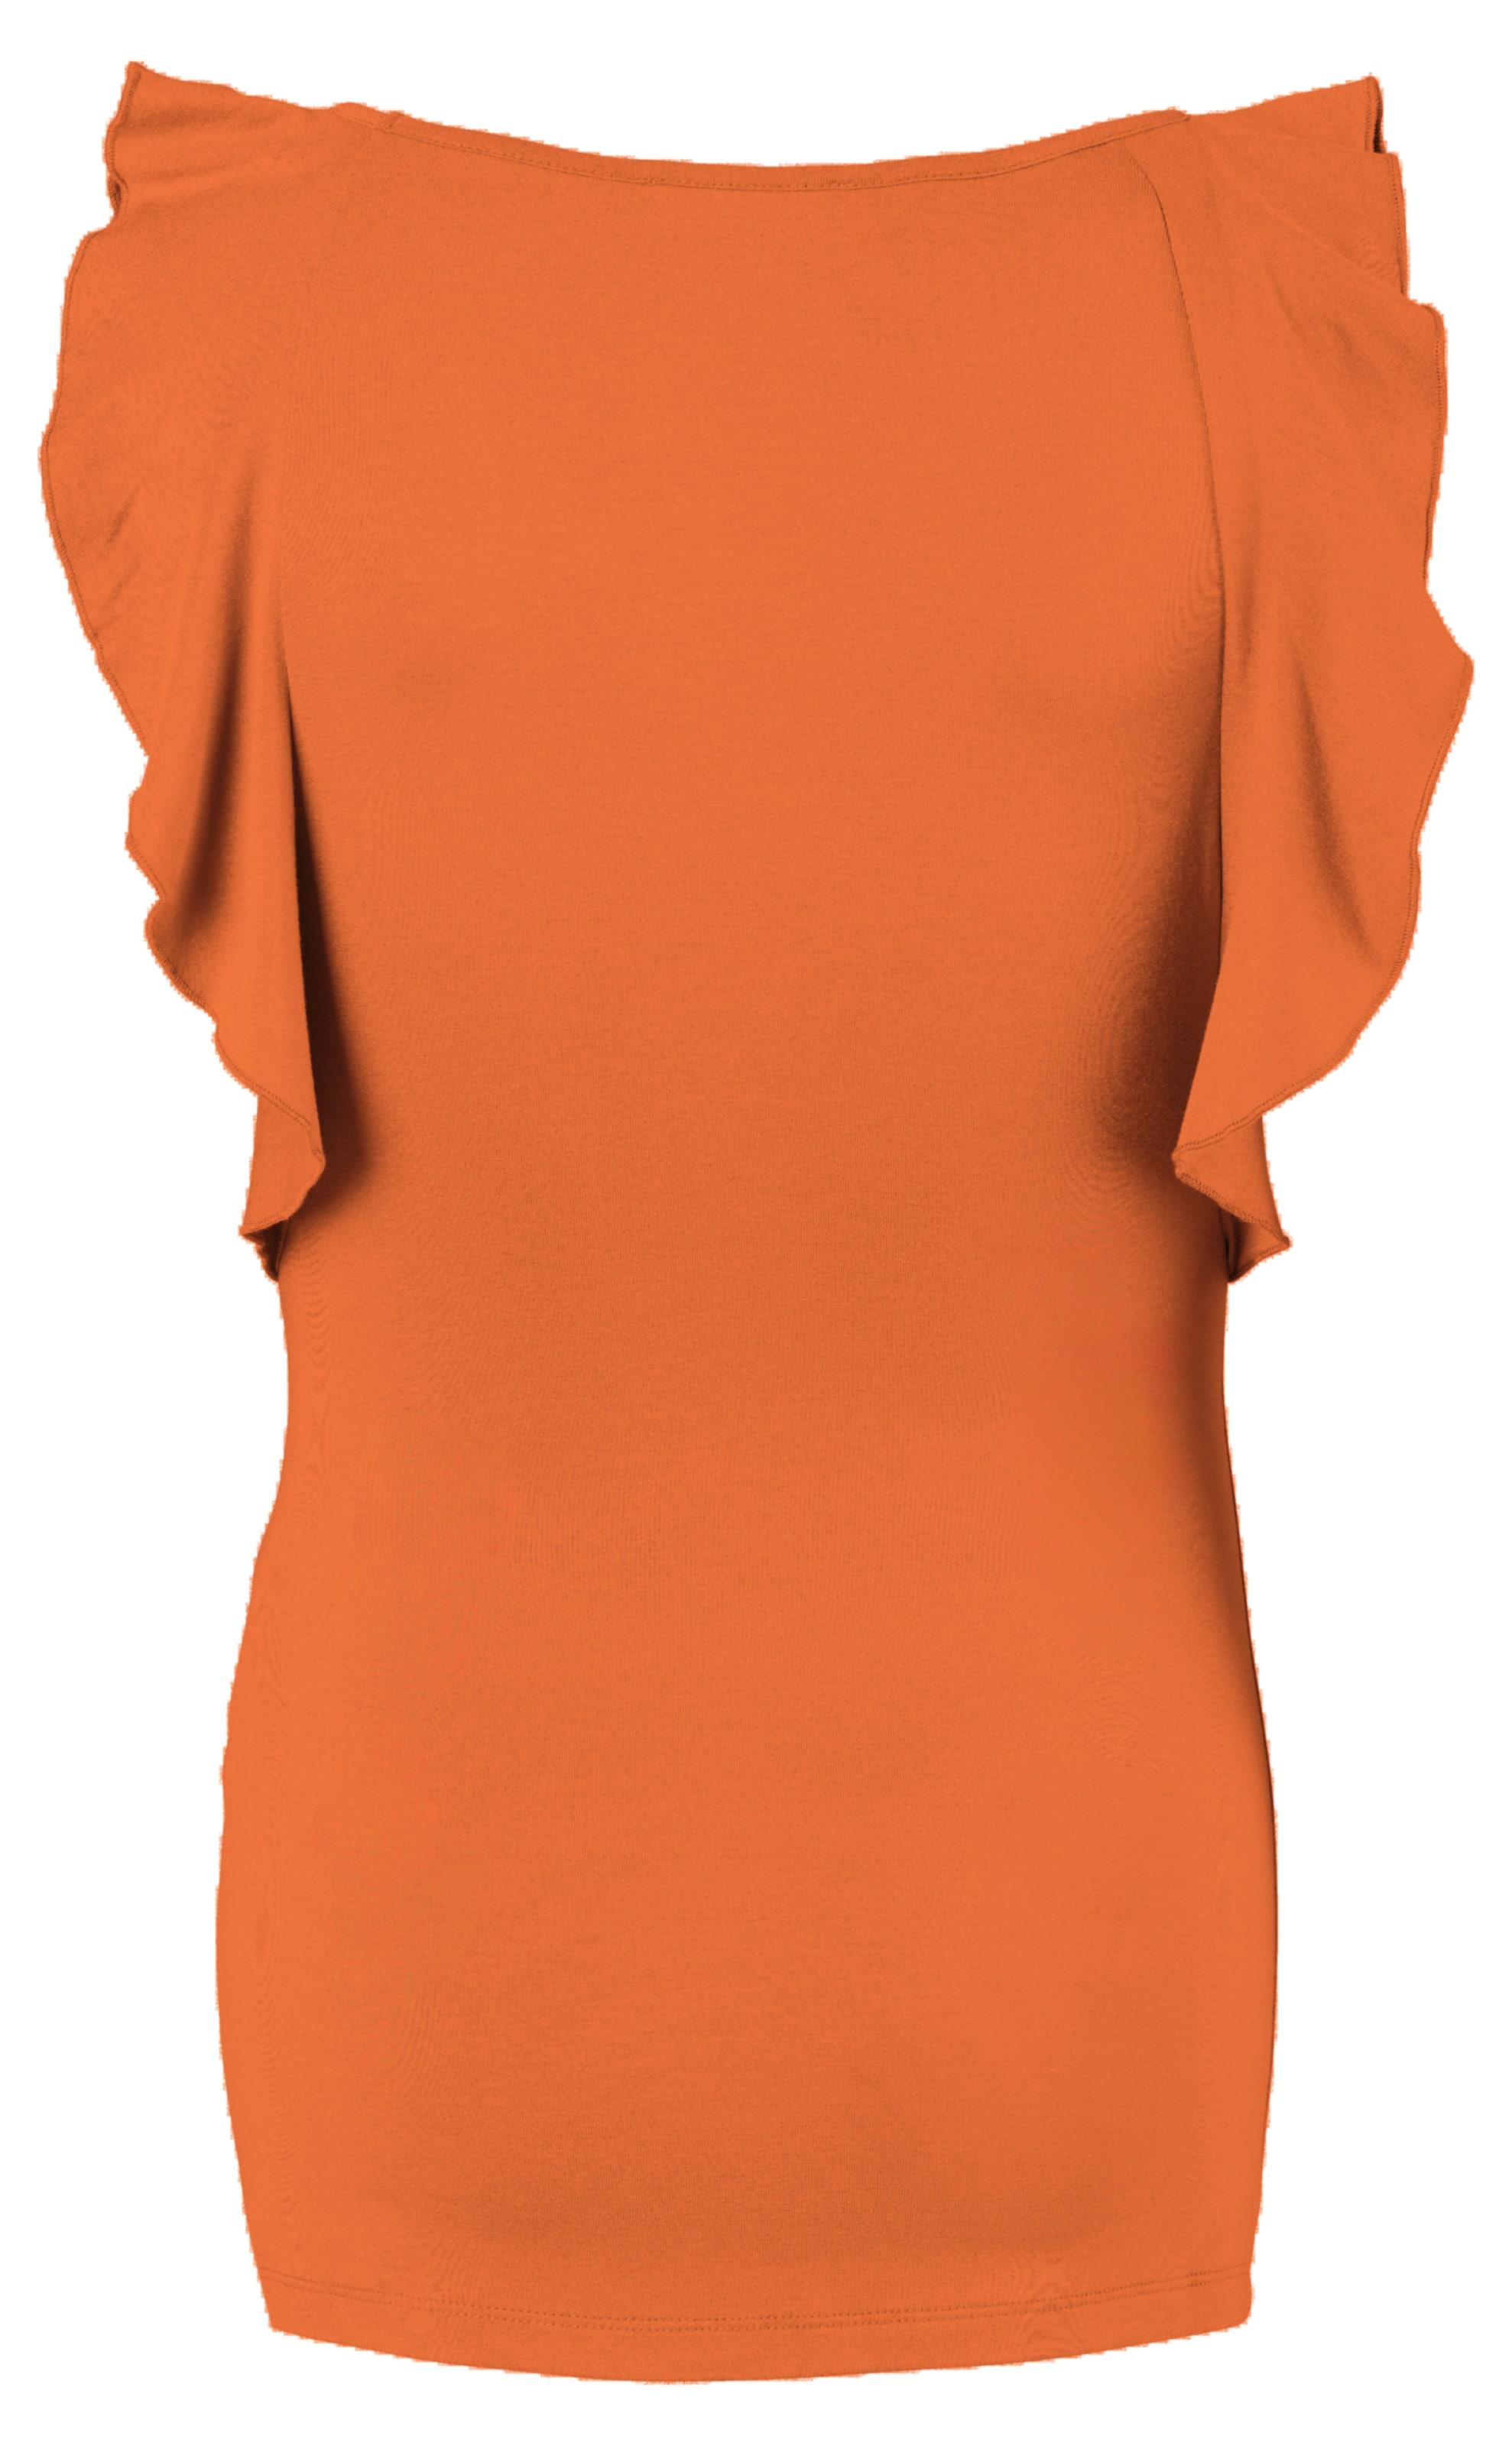 QUEEN MUM T-shirt Neue Ankunft Günstig Online Echte Online cx1ETNJs5